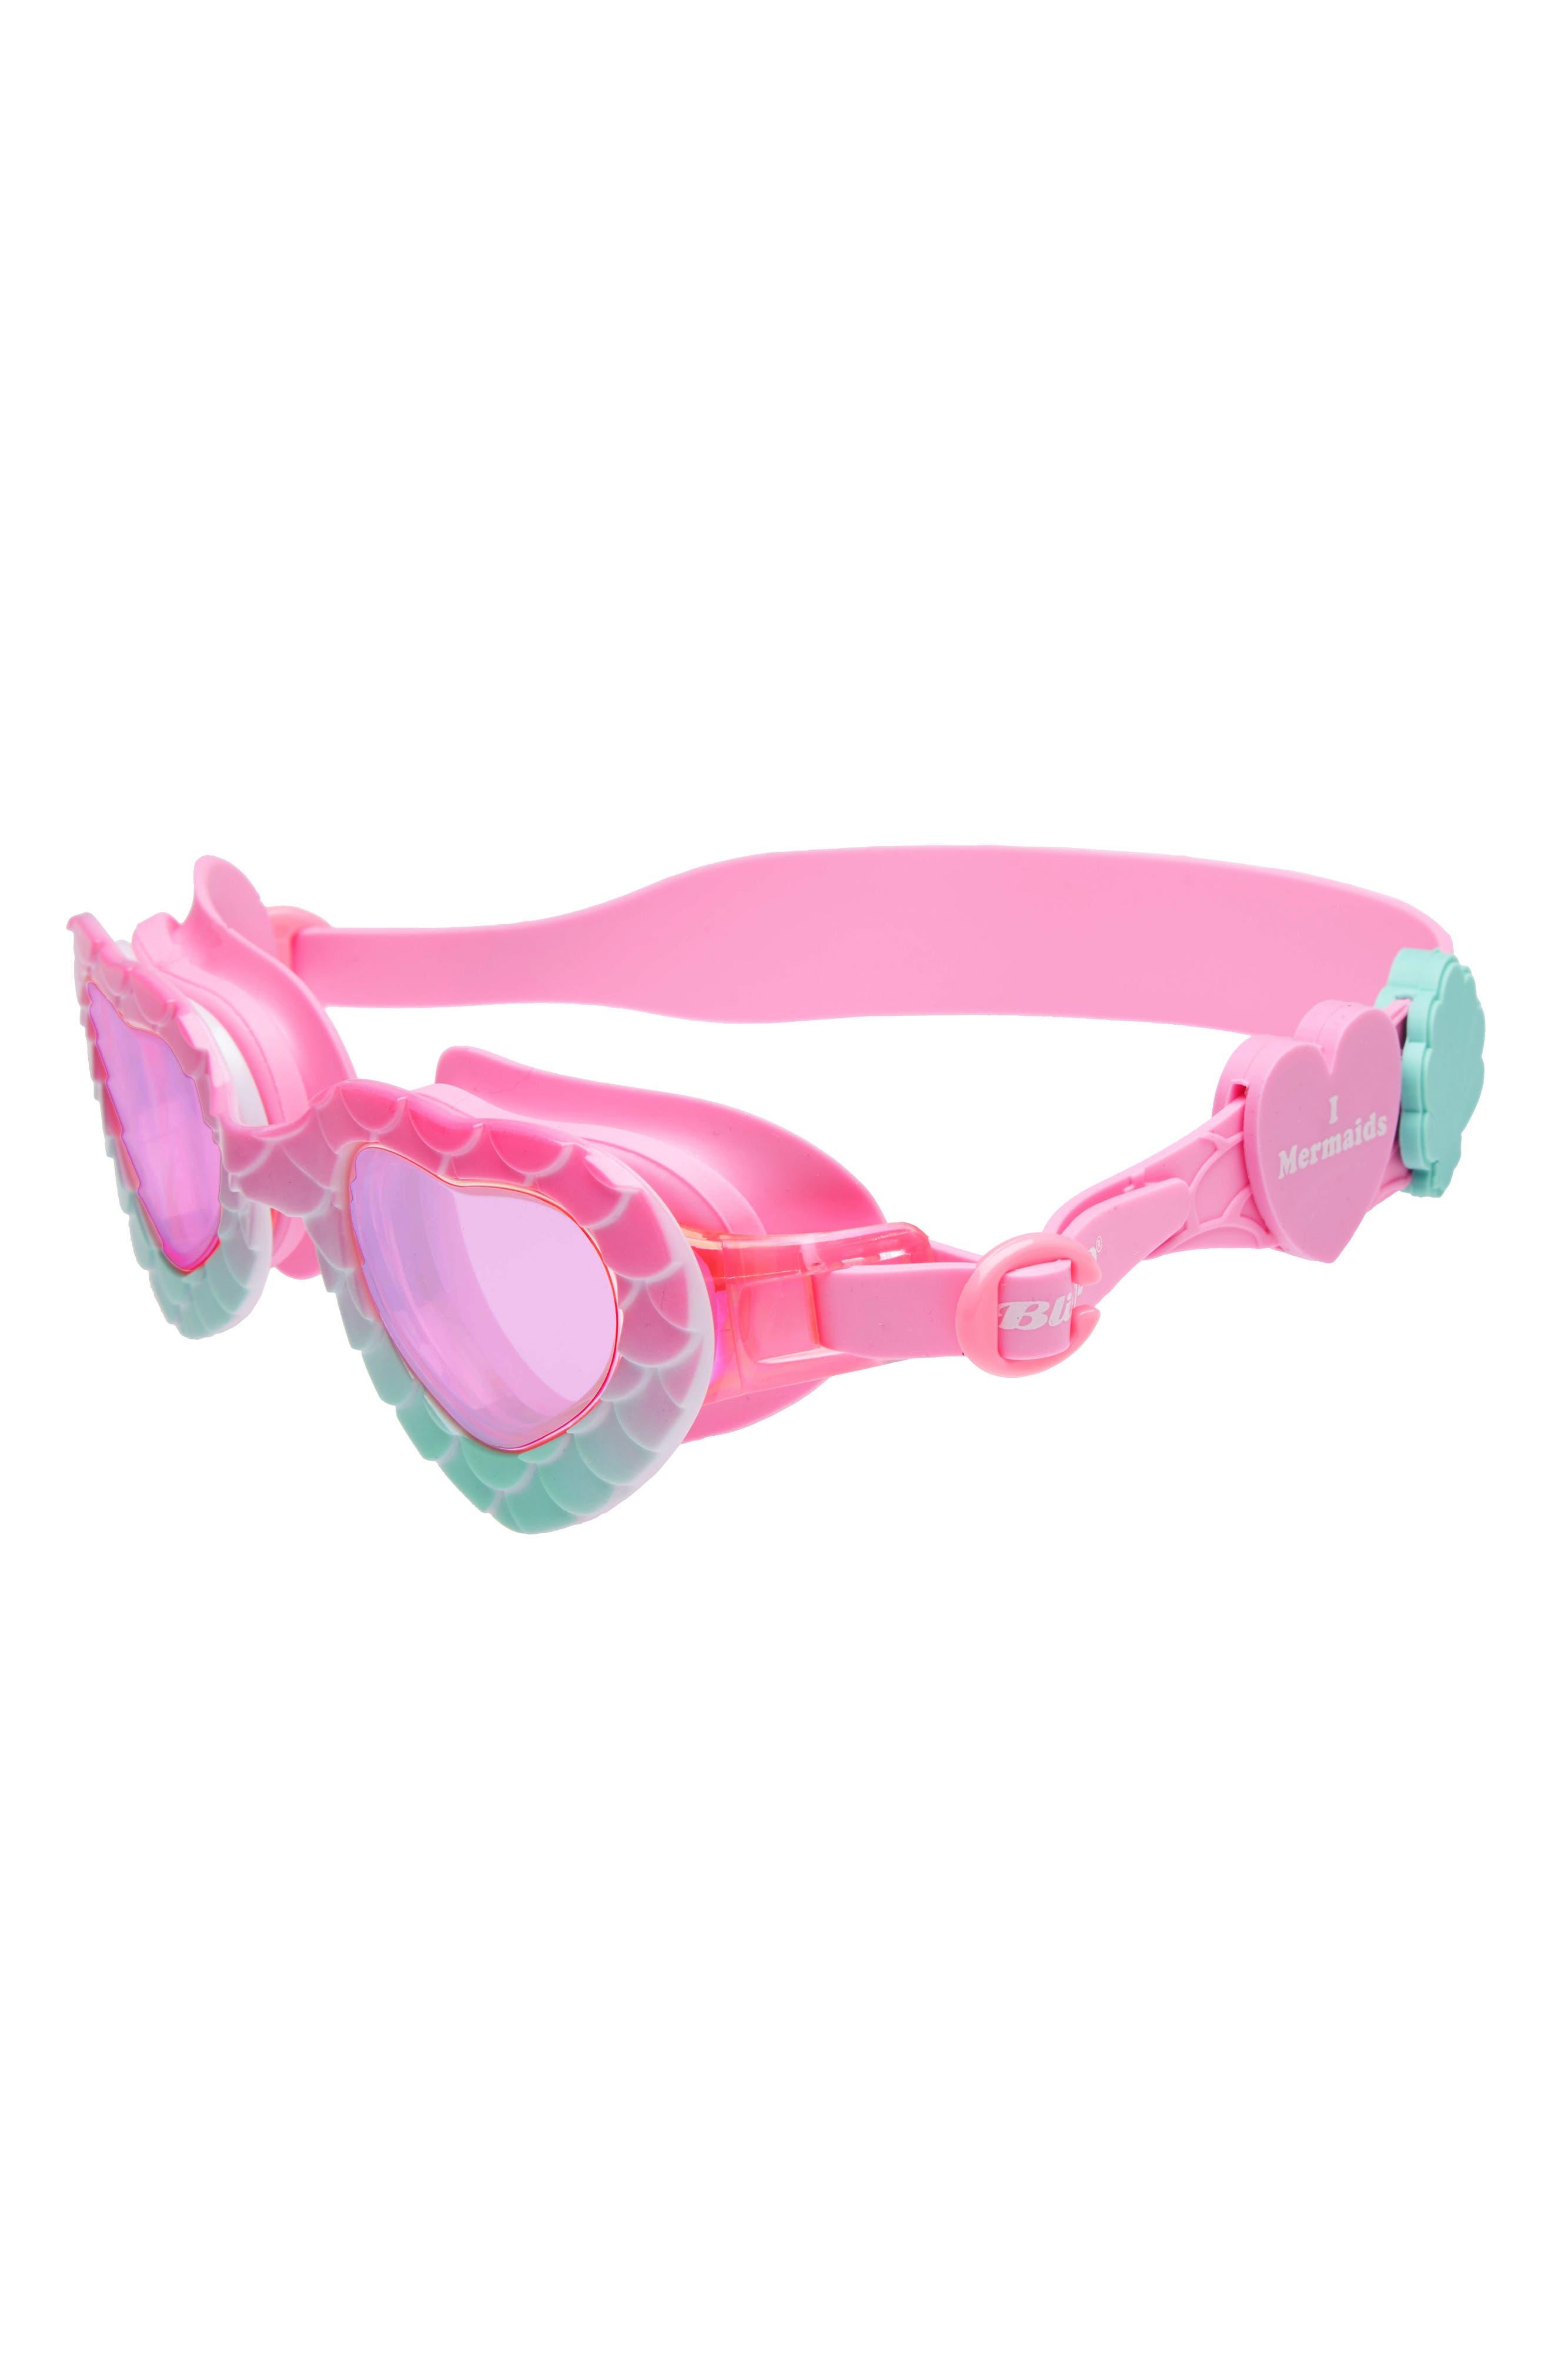 I Love Mermaids Swim Goggles,                         Main,                         color, 300